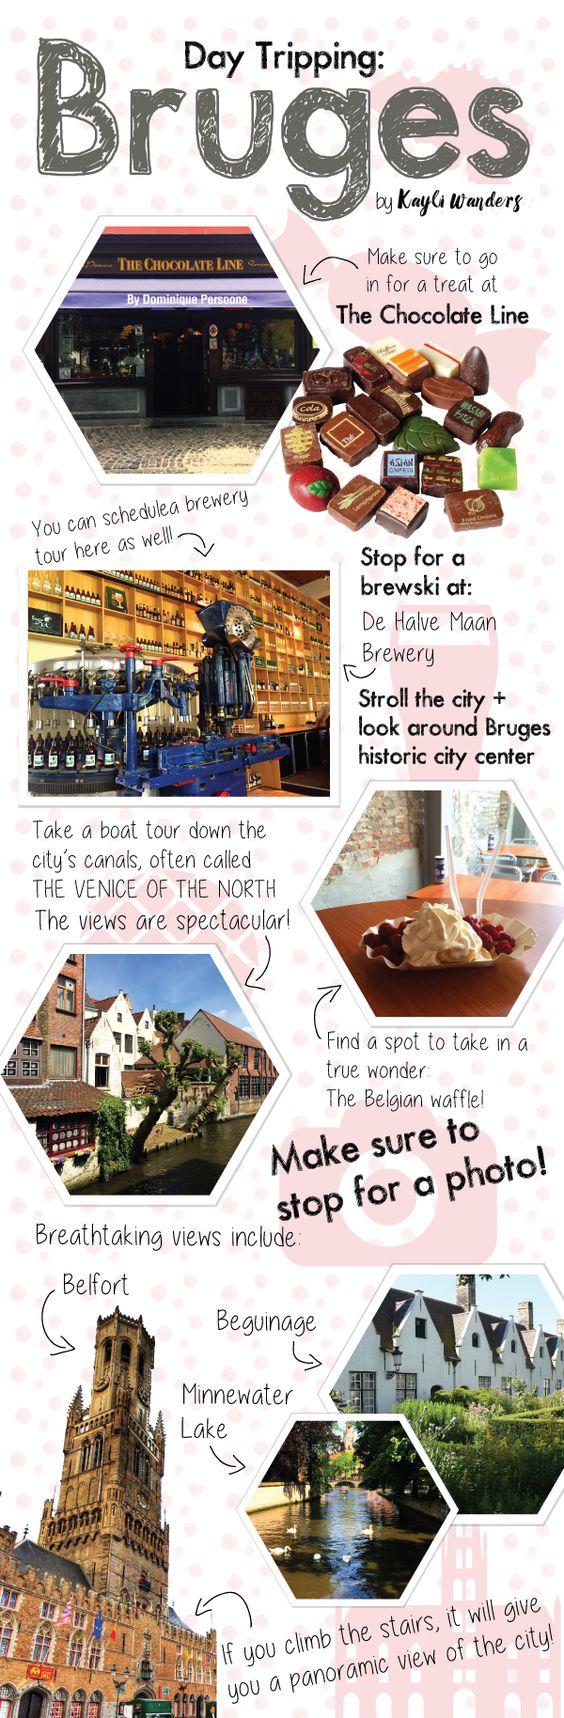 Day Tripping: Bruges, Belgium